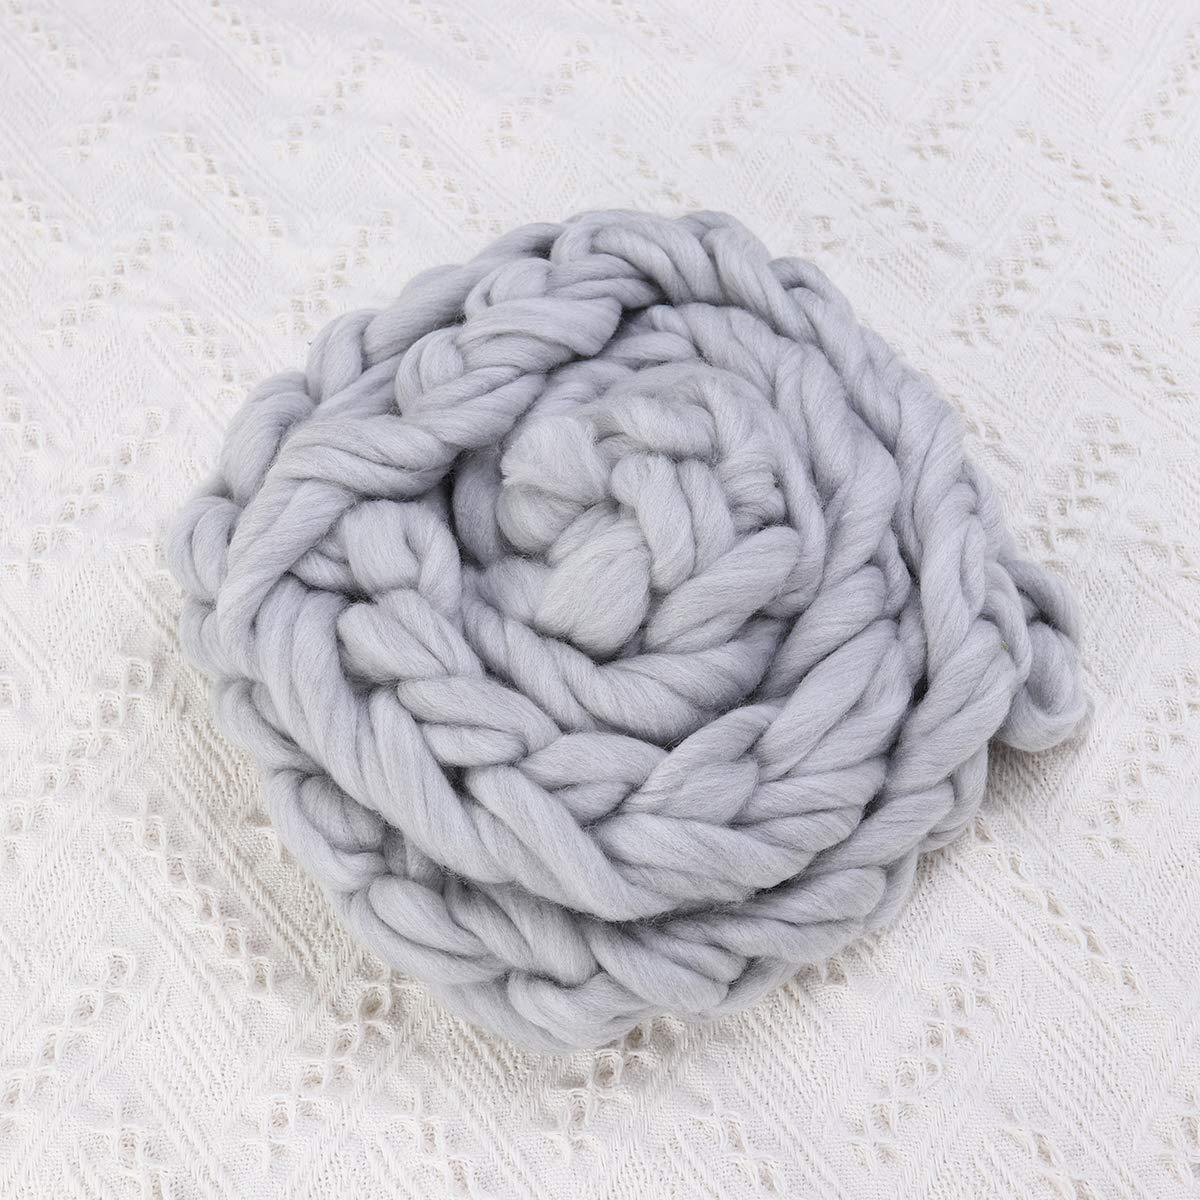 Museya Newborn Photography Props Baby Hand-woven Twisted Braid Rug Blanket